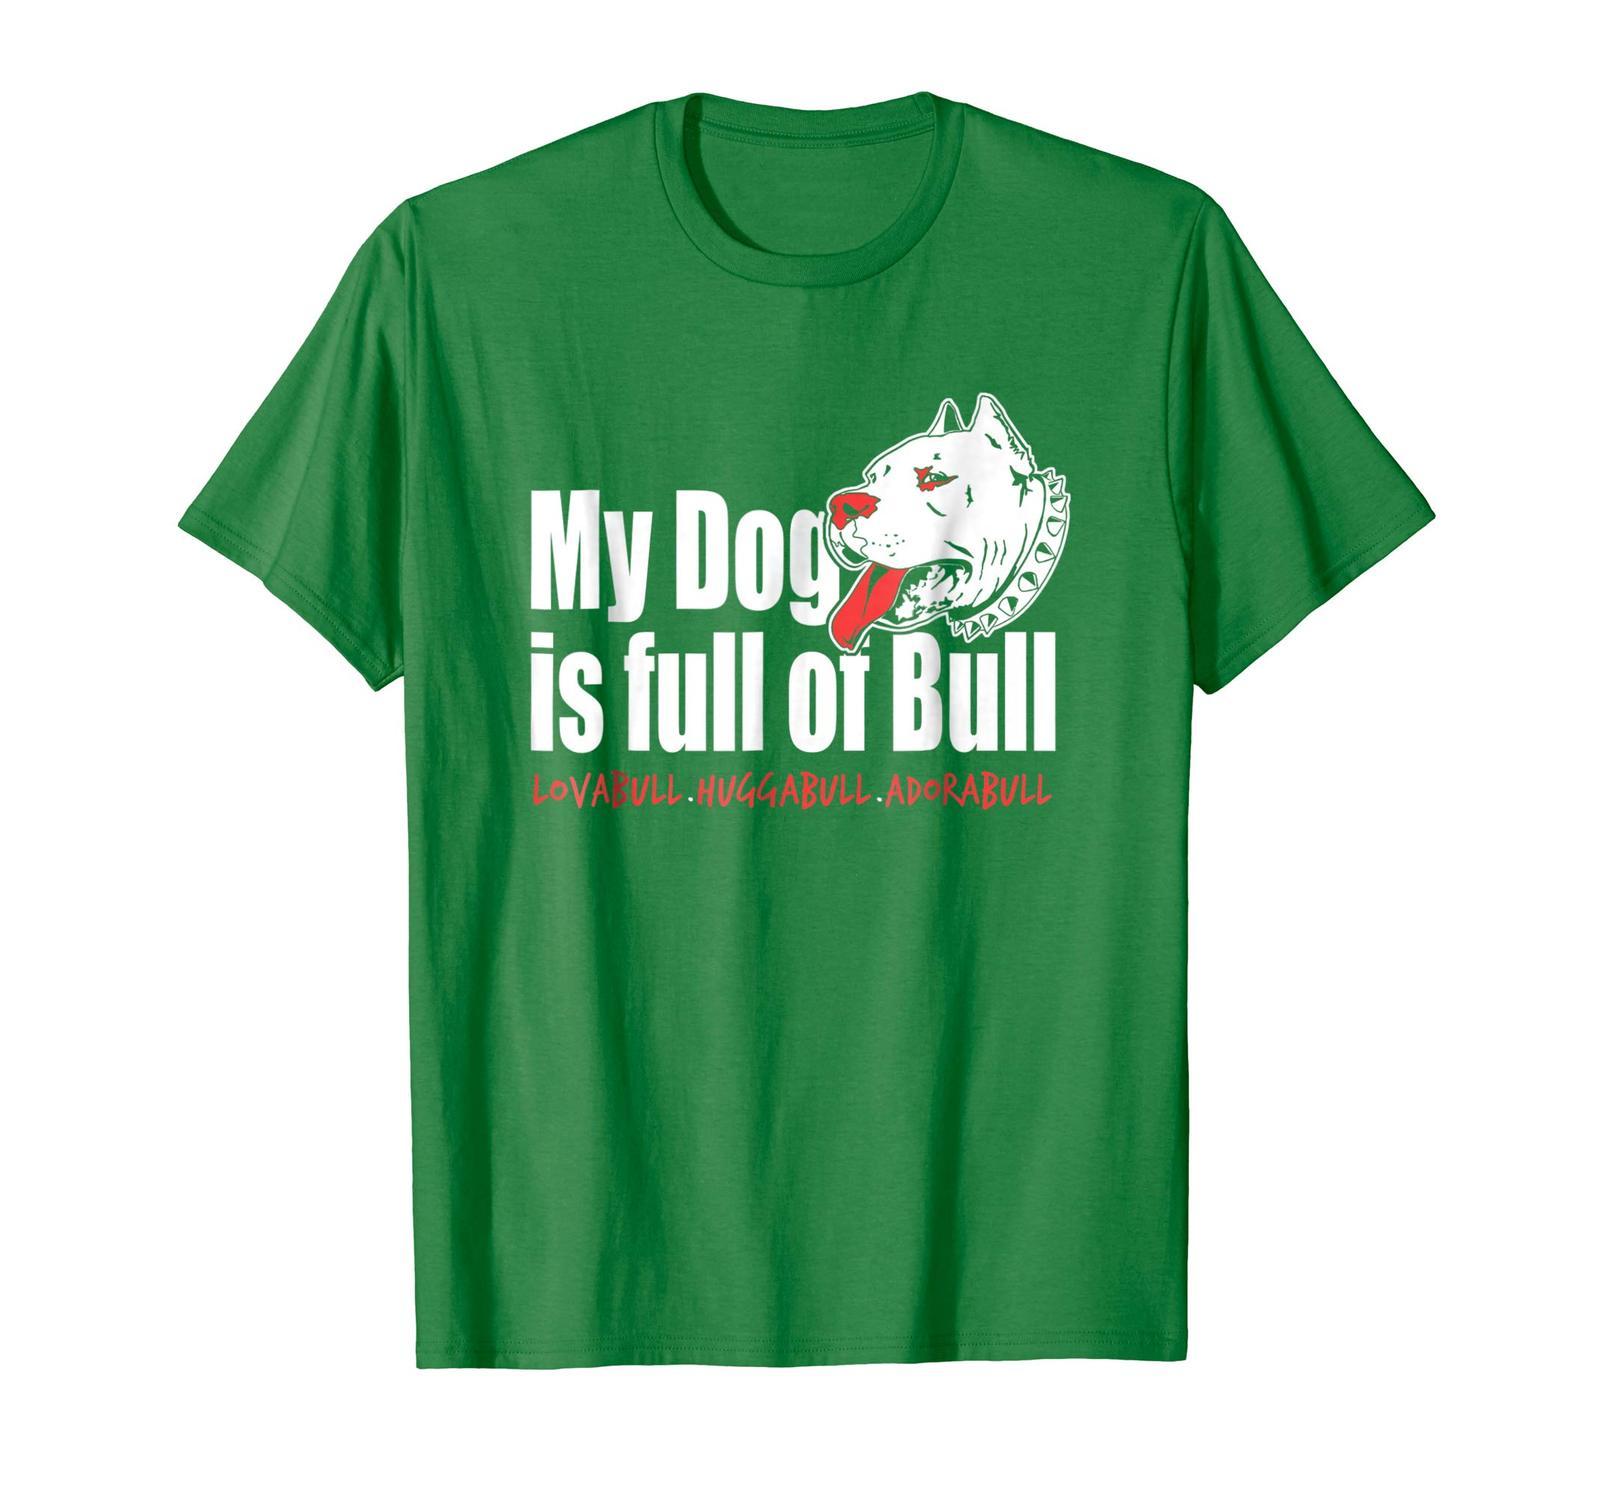 Brother Shirts - My Dog Is Full Of Bull PitBull Love Hug Adore Tee Shirt Men